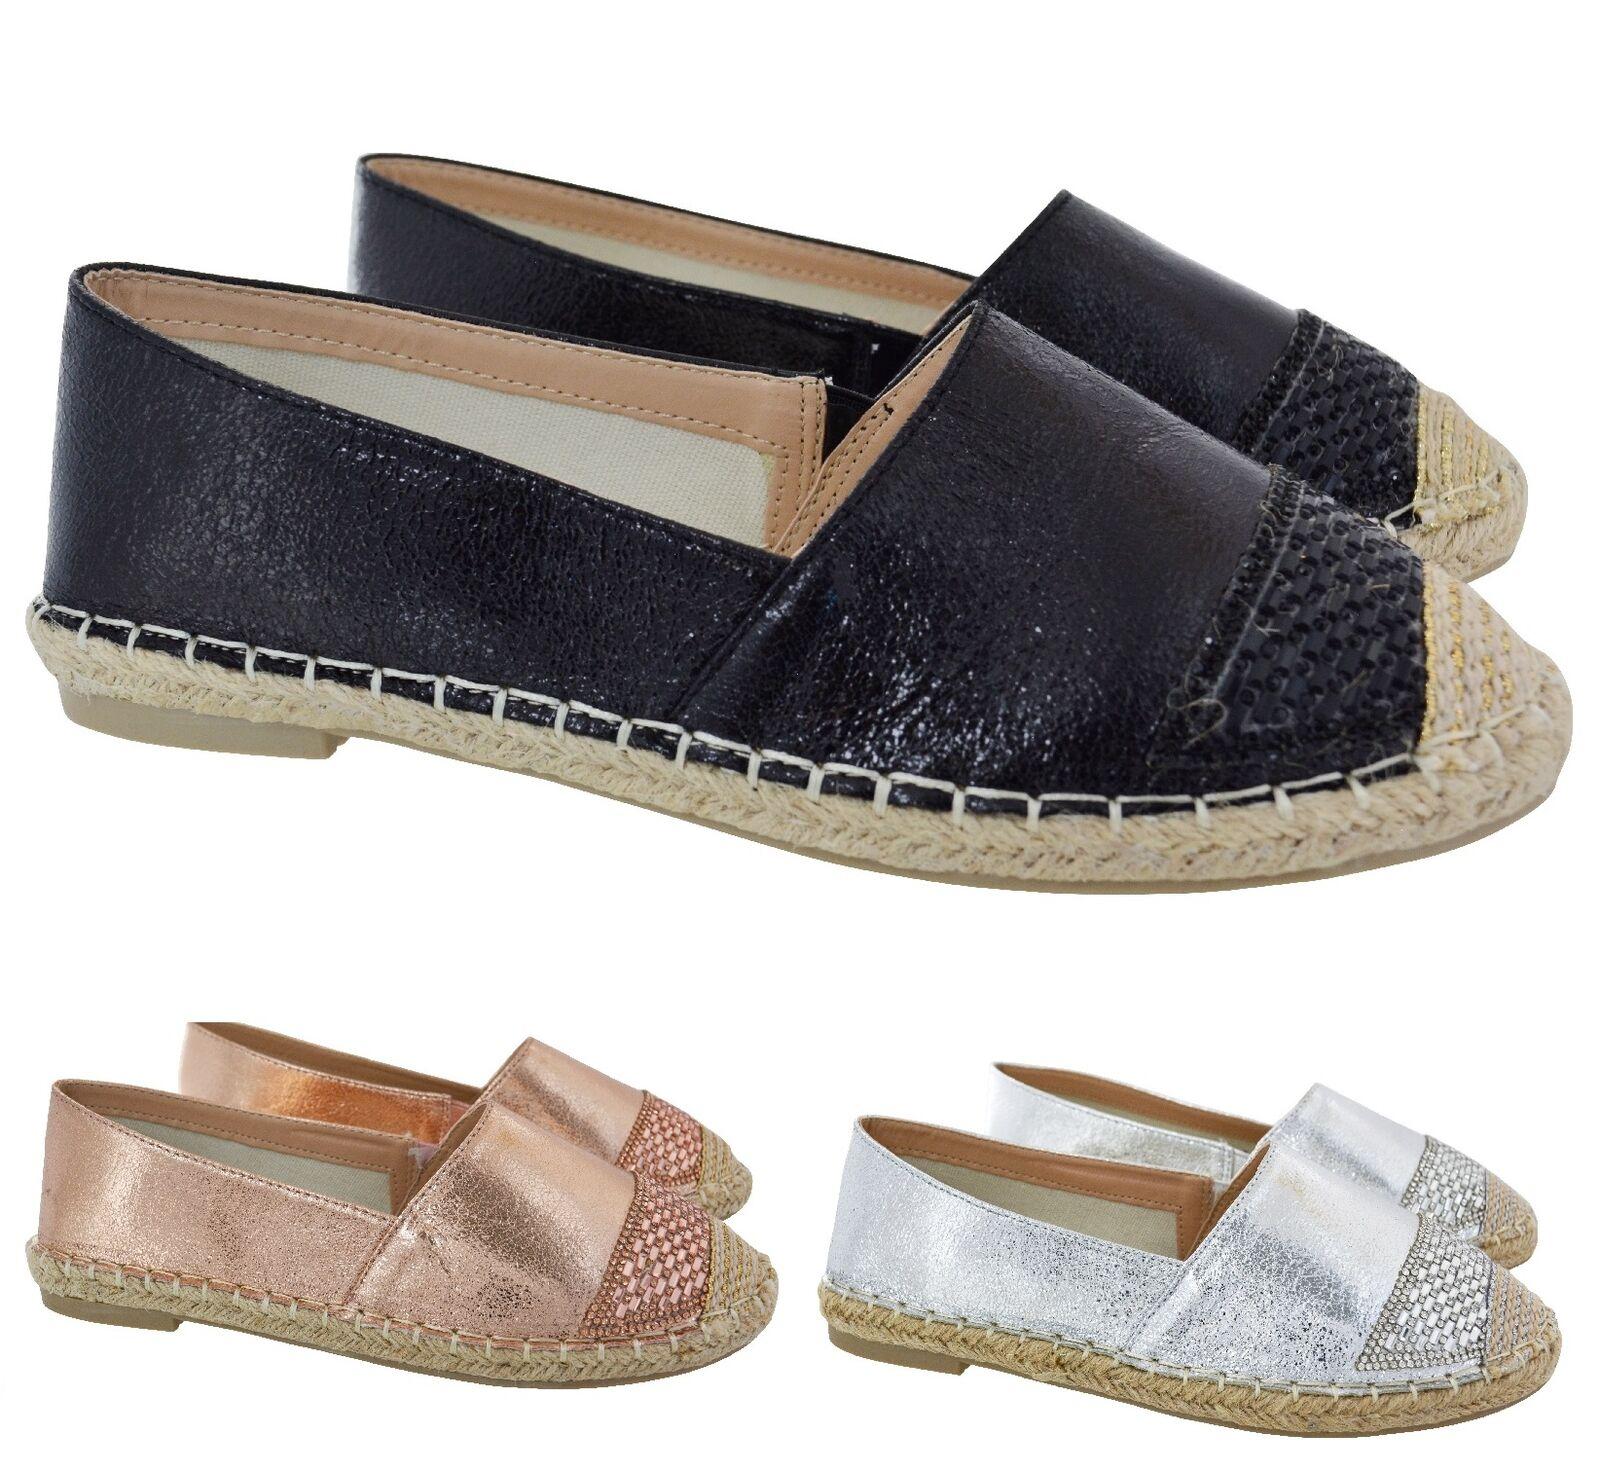 Mujer COMFY FLAT PUMPS BEACH HOLIDAY HOLIDAY BEACH ESPADRILLES LADIES SUMMER SANDALS Zapatos SZ dd690e